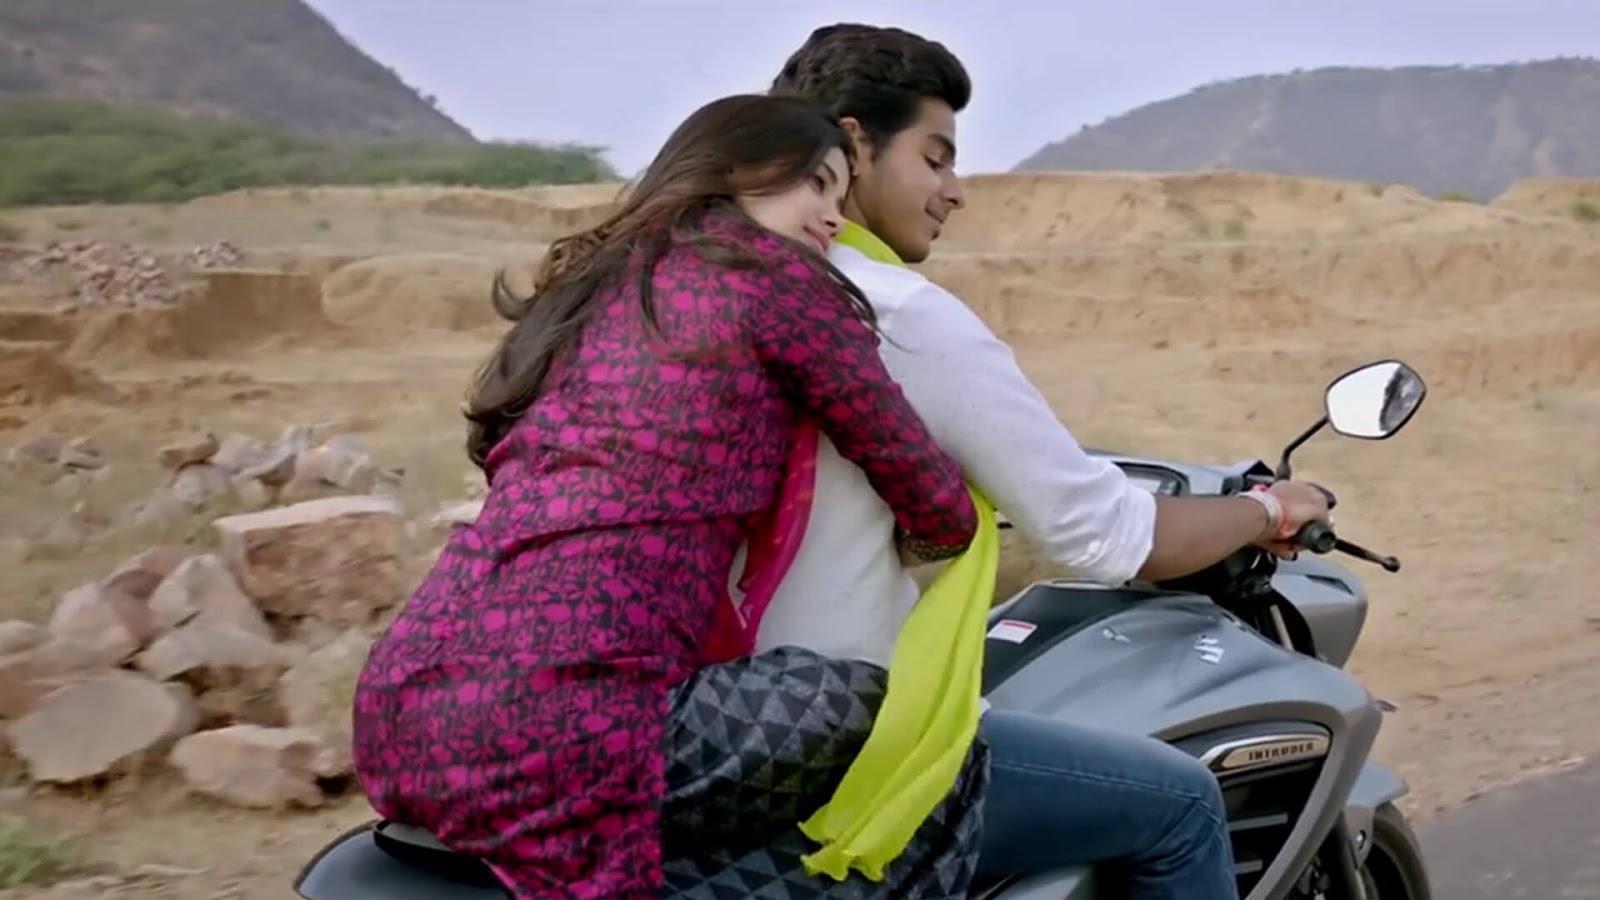 dhadak full hd free movie download